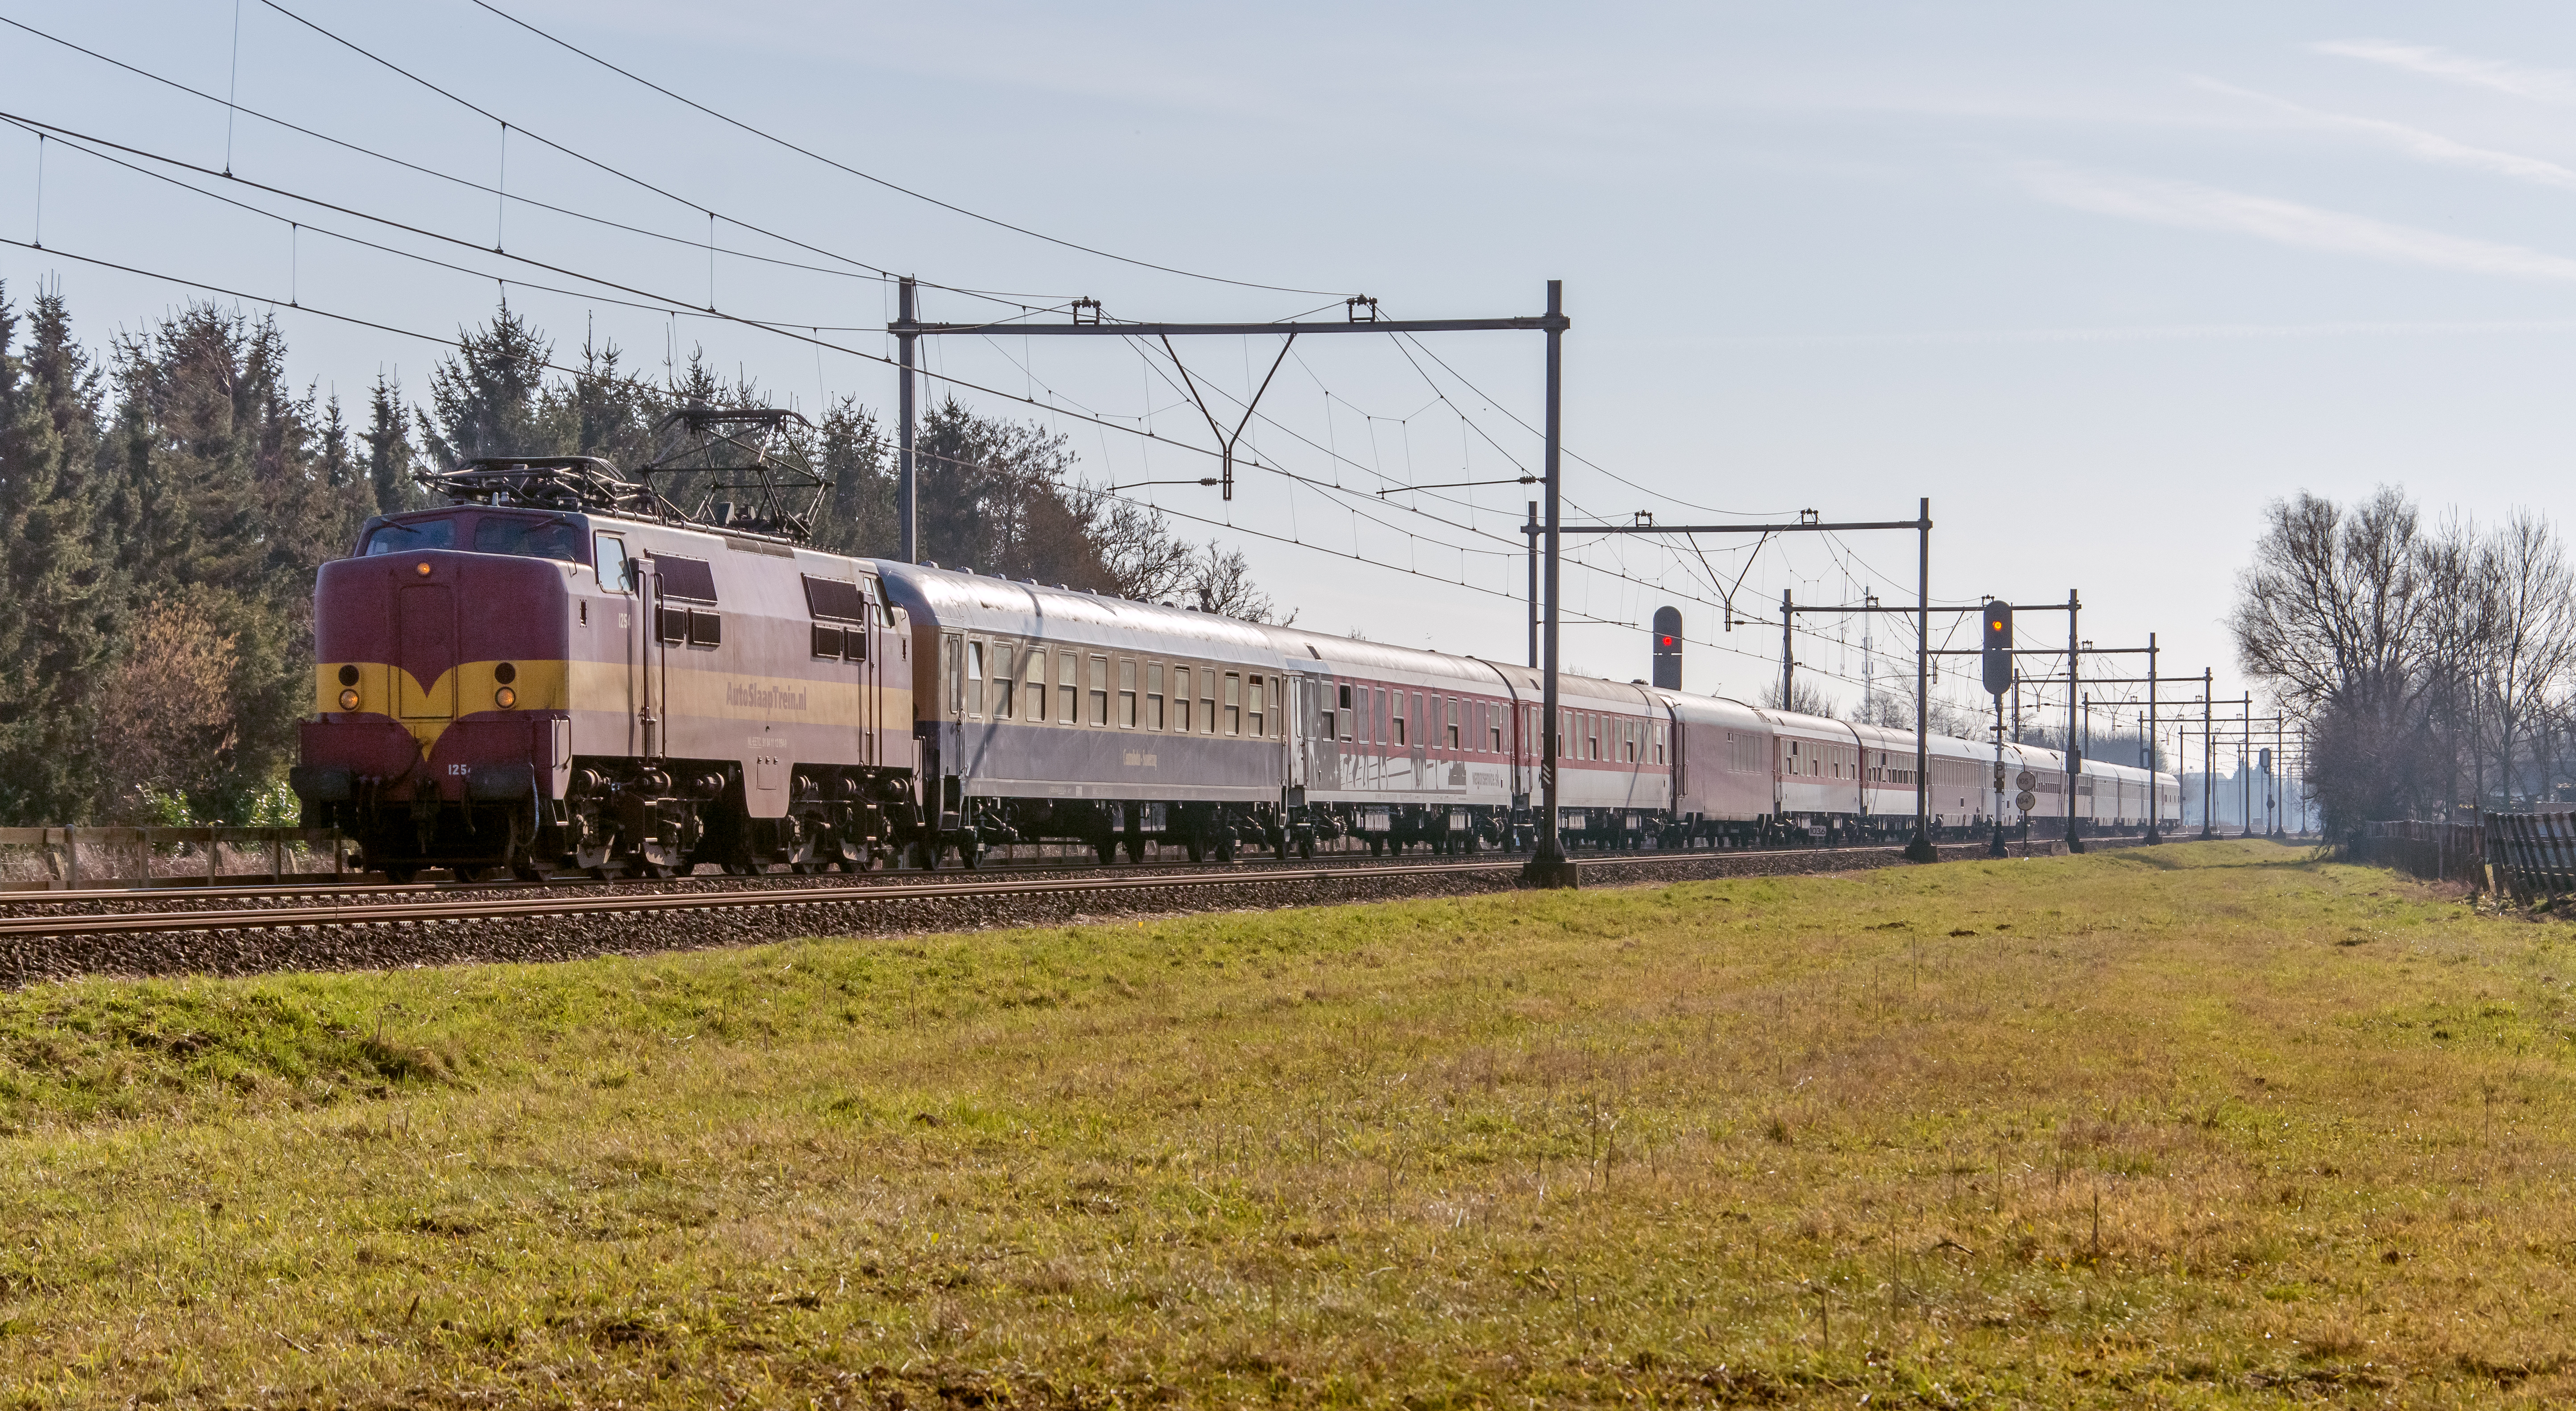 File:Duiven EETC 1254 met de Alpen Express naar Amsterdam (16564856640).jpg